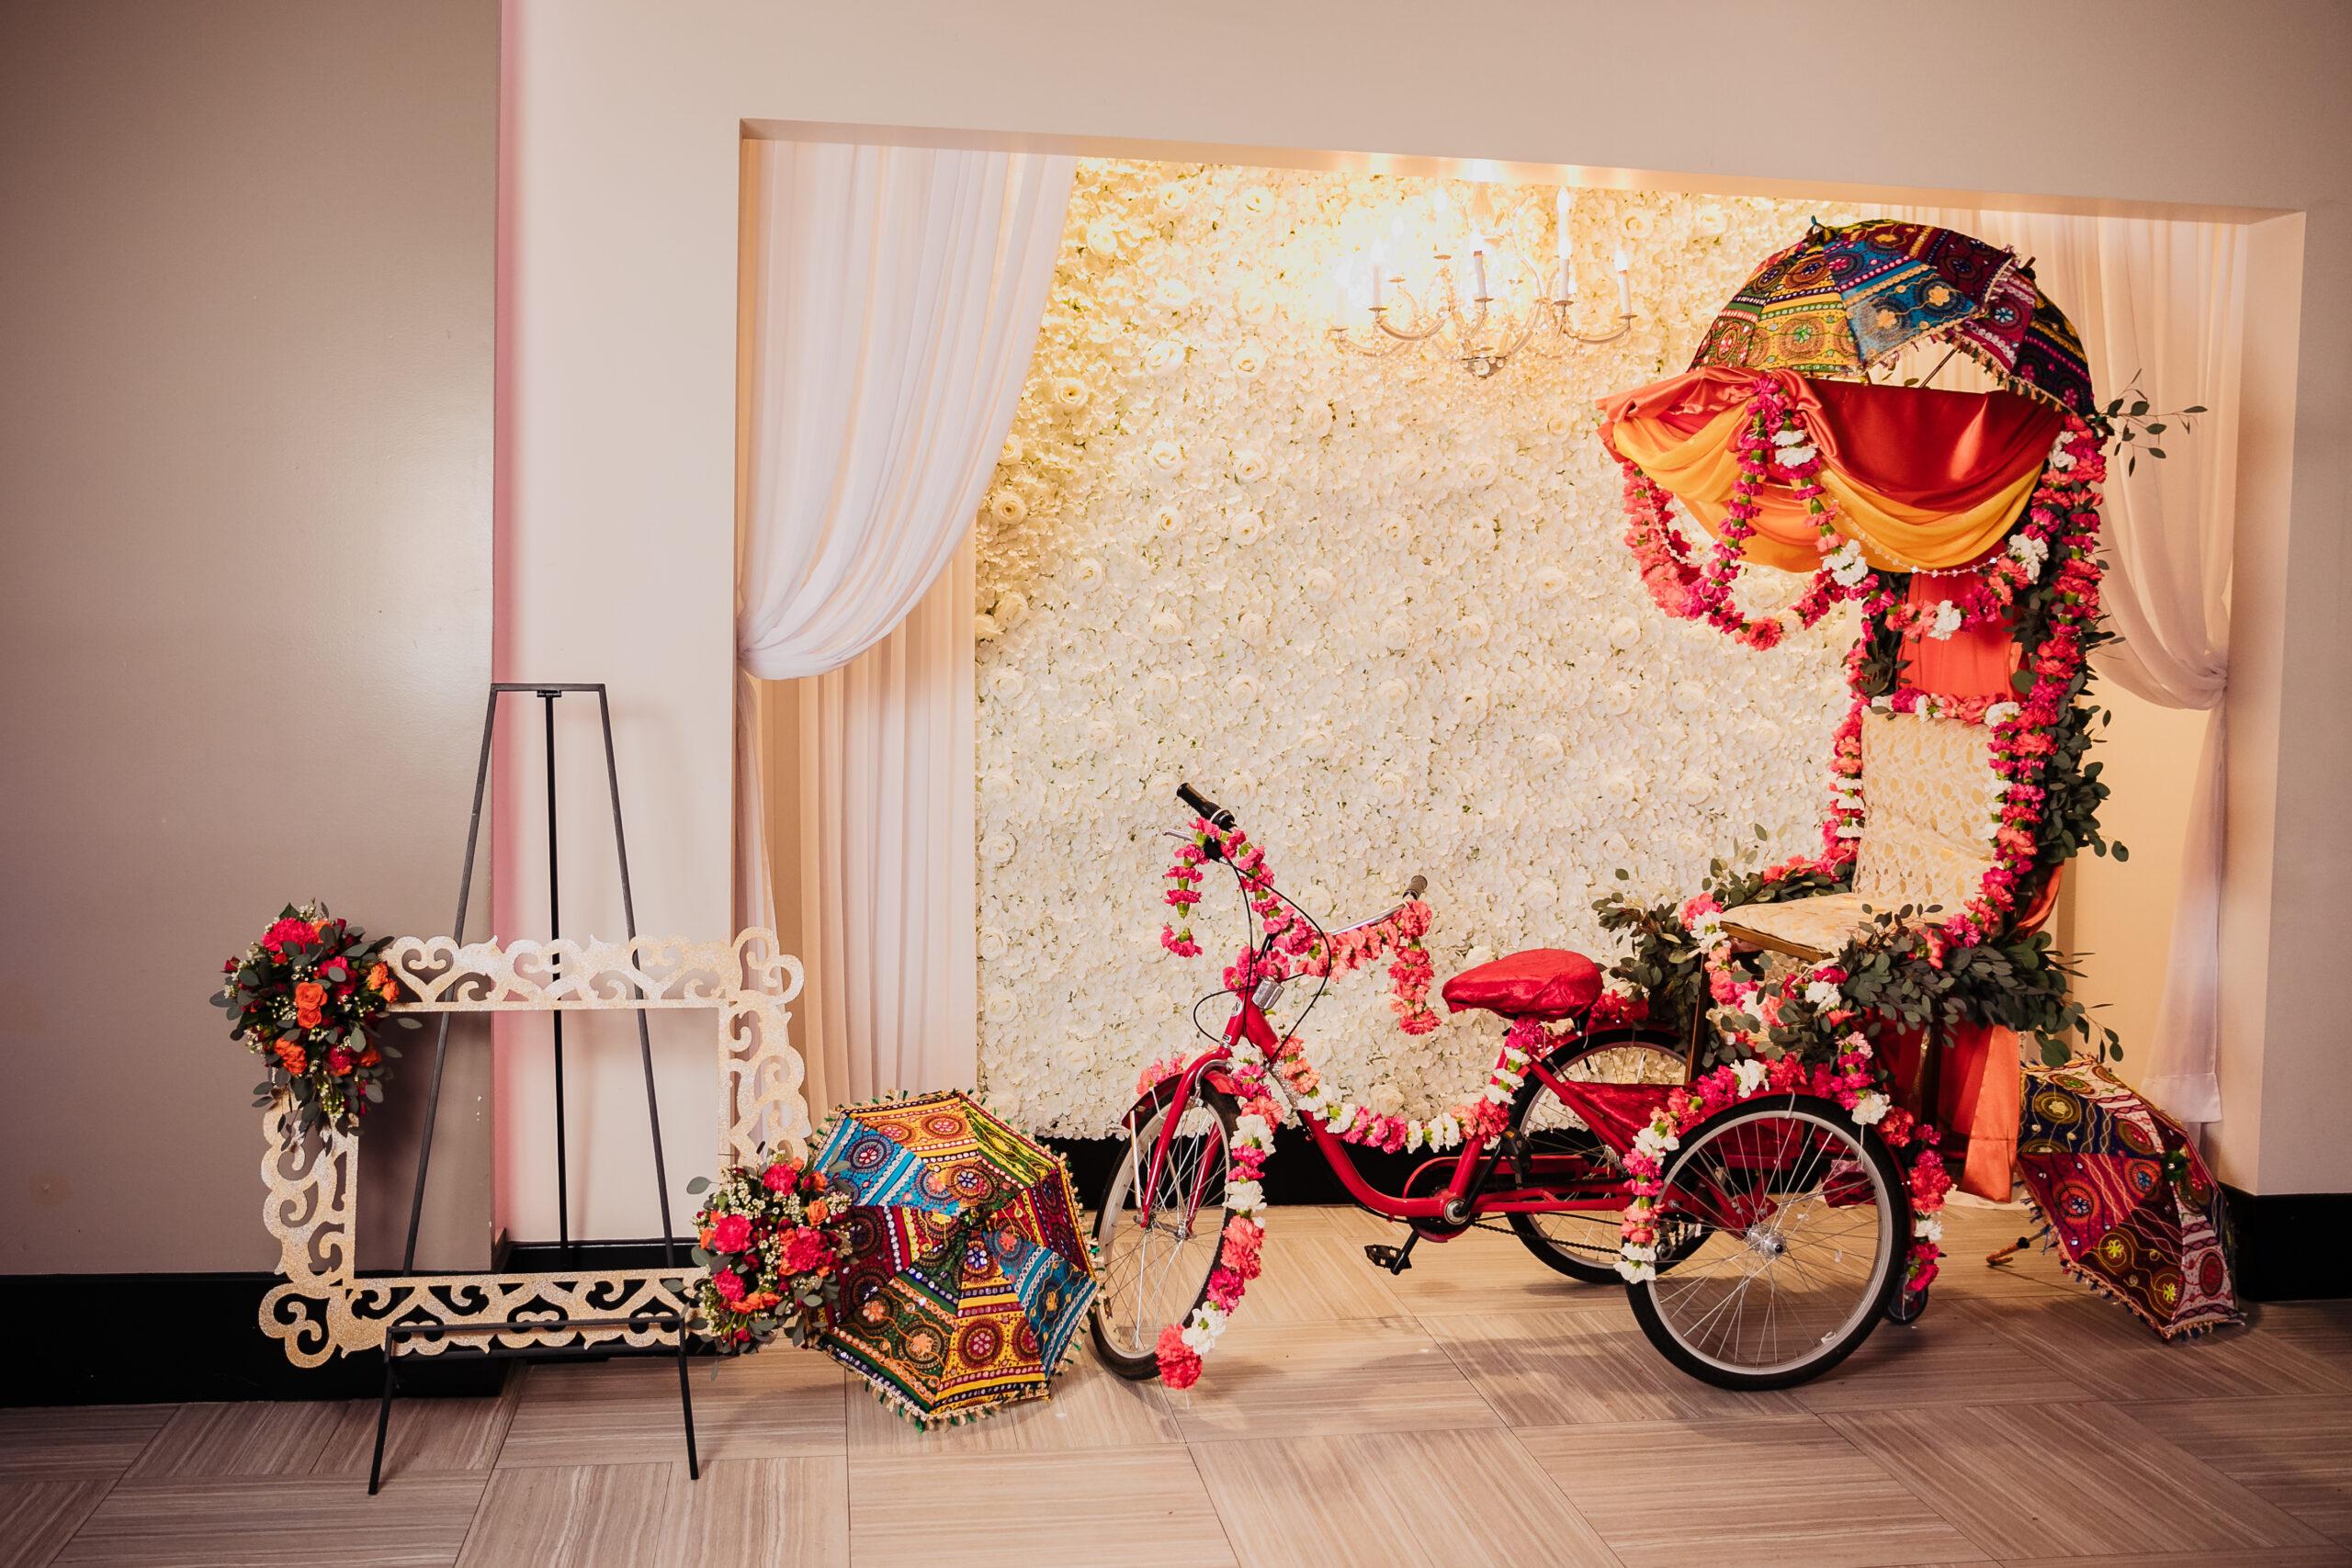 ER-Marinaj-Banquets-Wedding-Photography-30